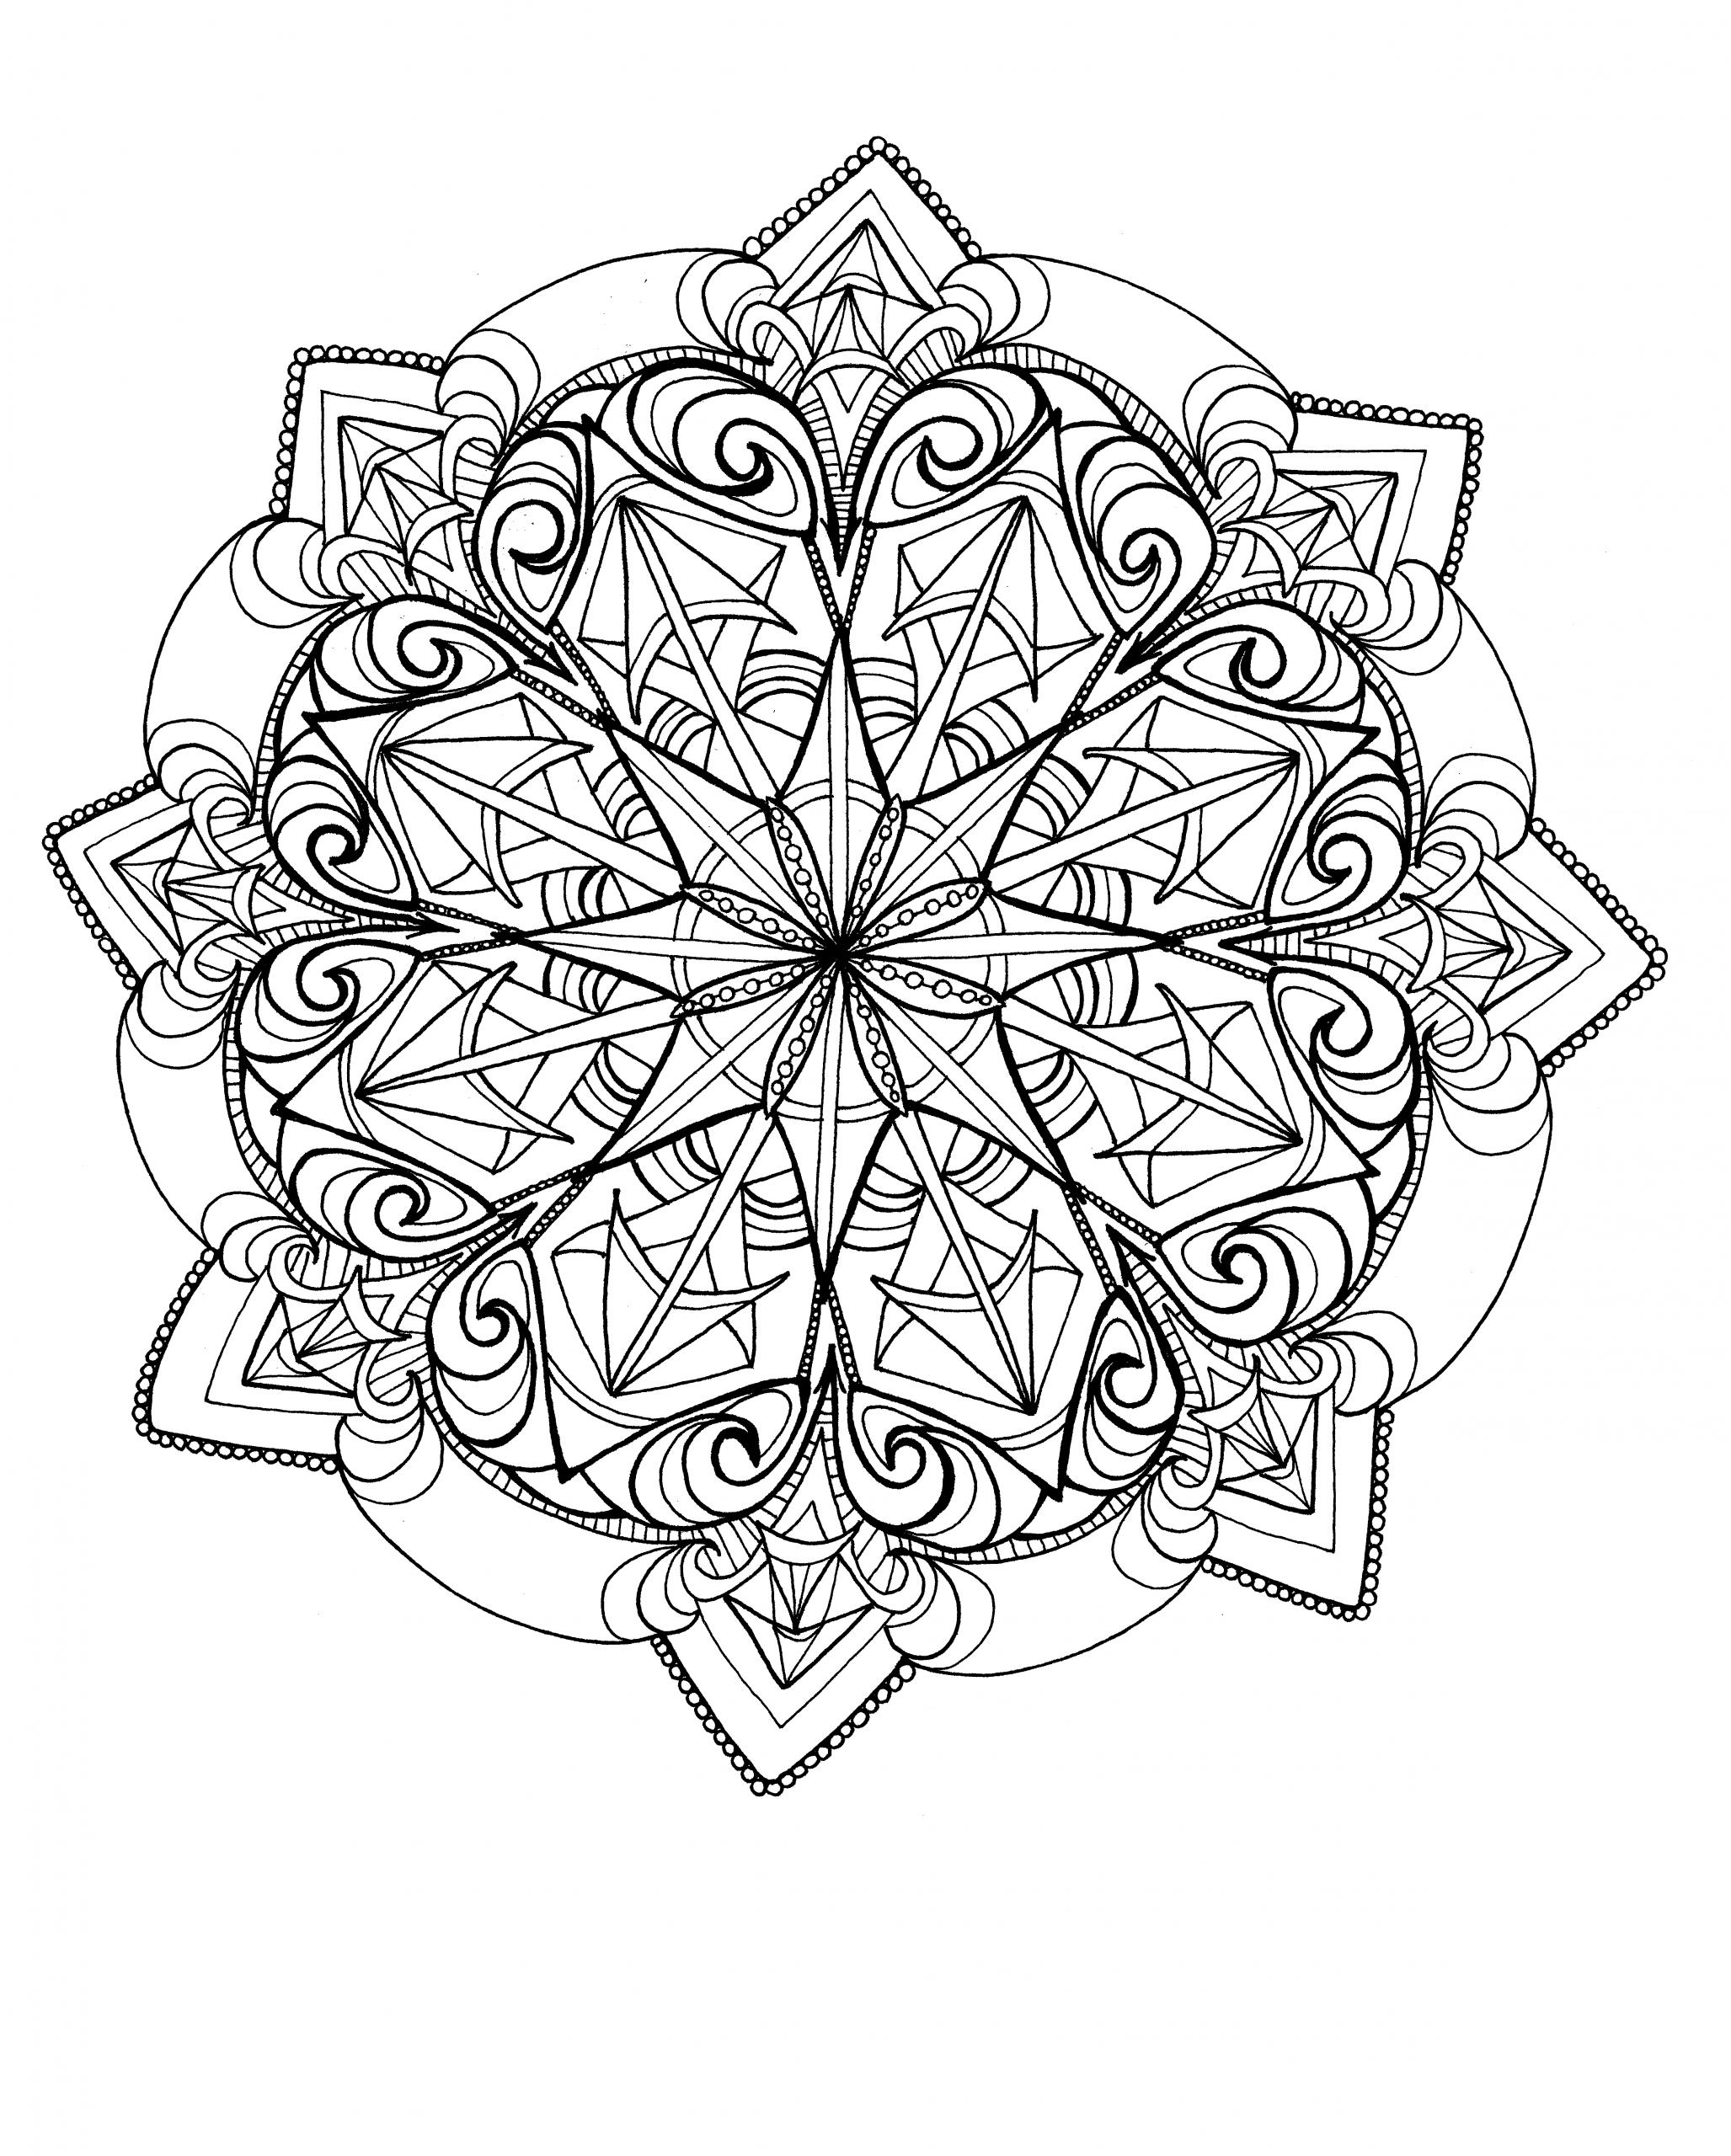 Summer Art Experiences: Drawing Mandalas - Columbia Center For The Arts à Mandala Fée